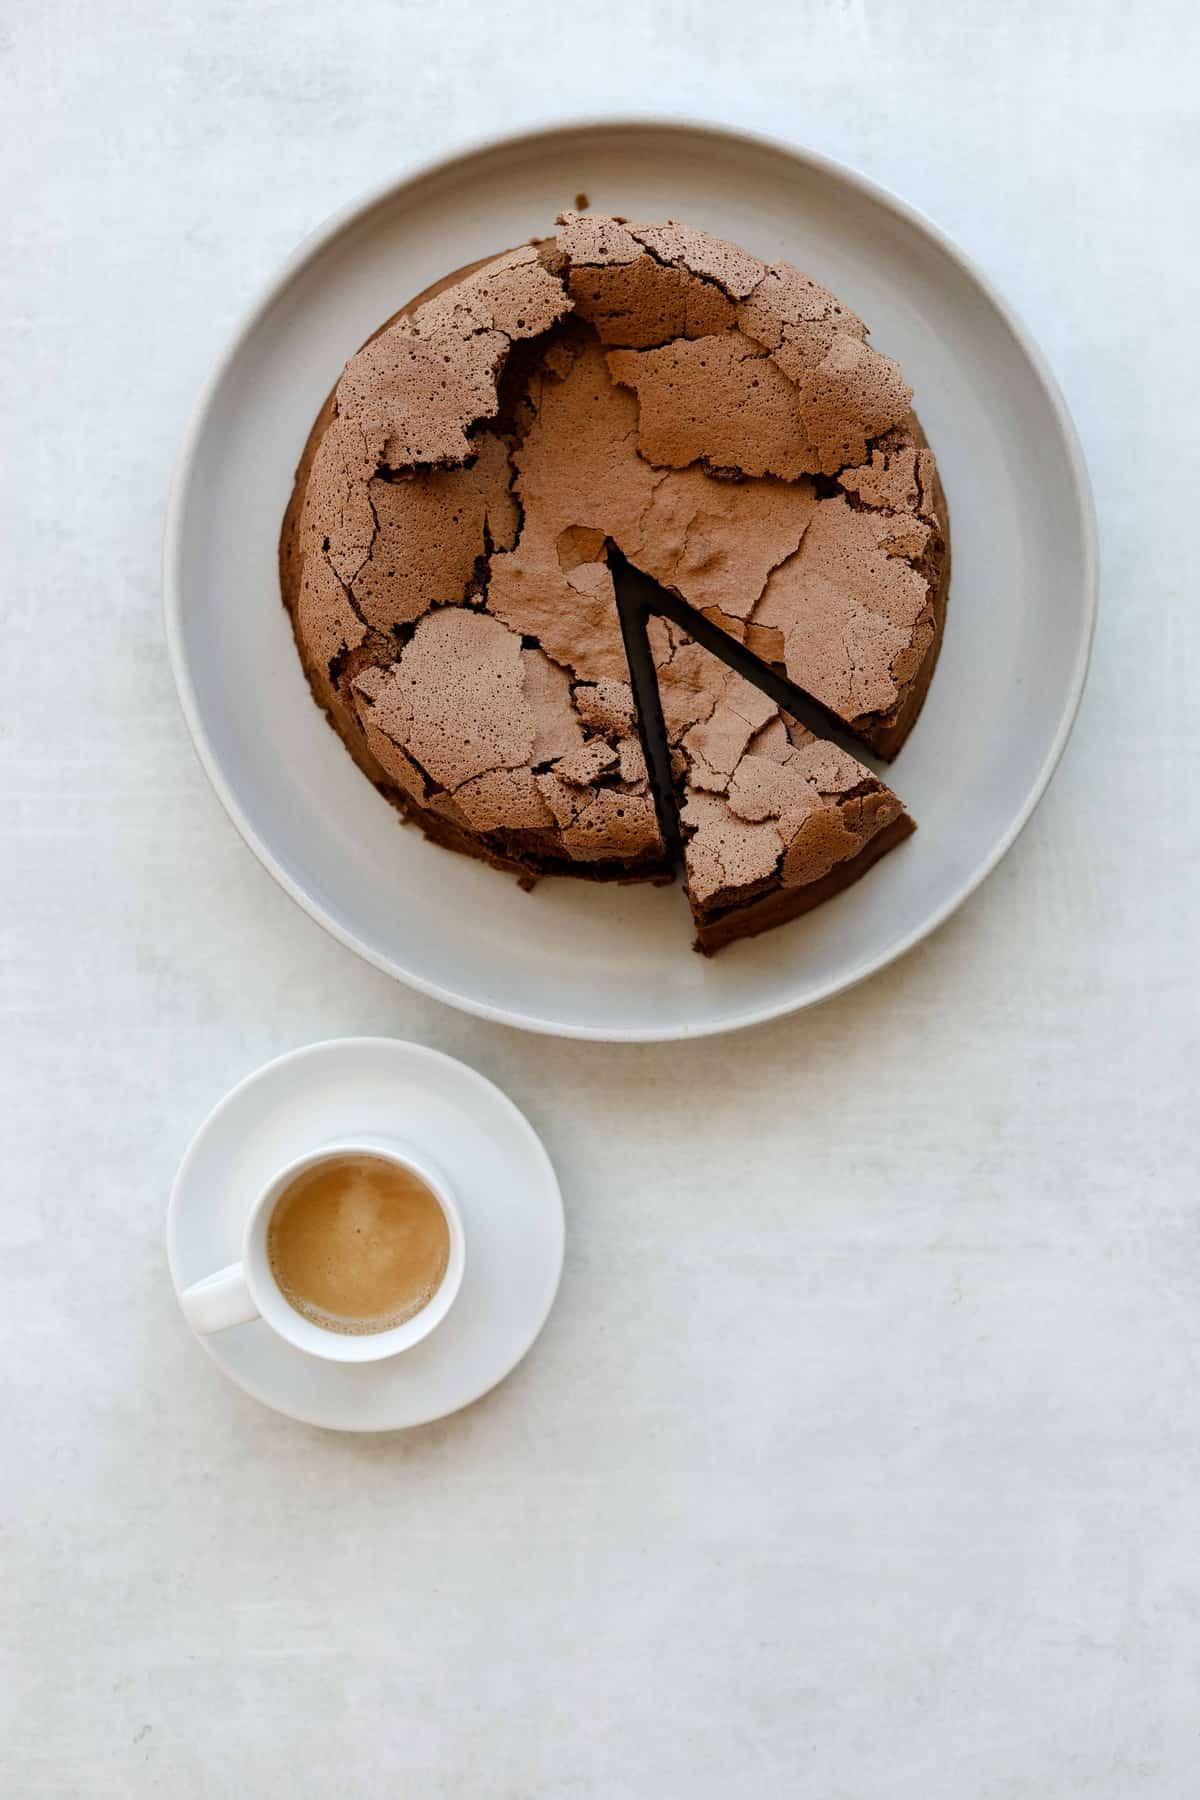 Flourless Chocolate Hazelnut Espresso Cake with a side of espresso